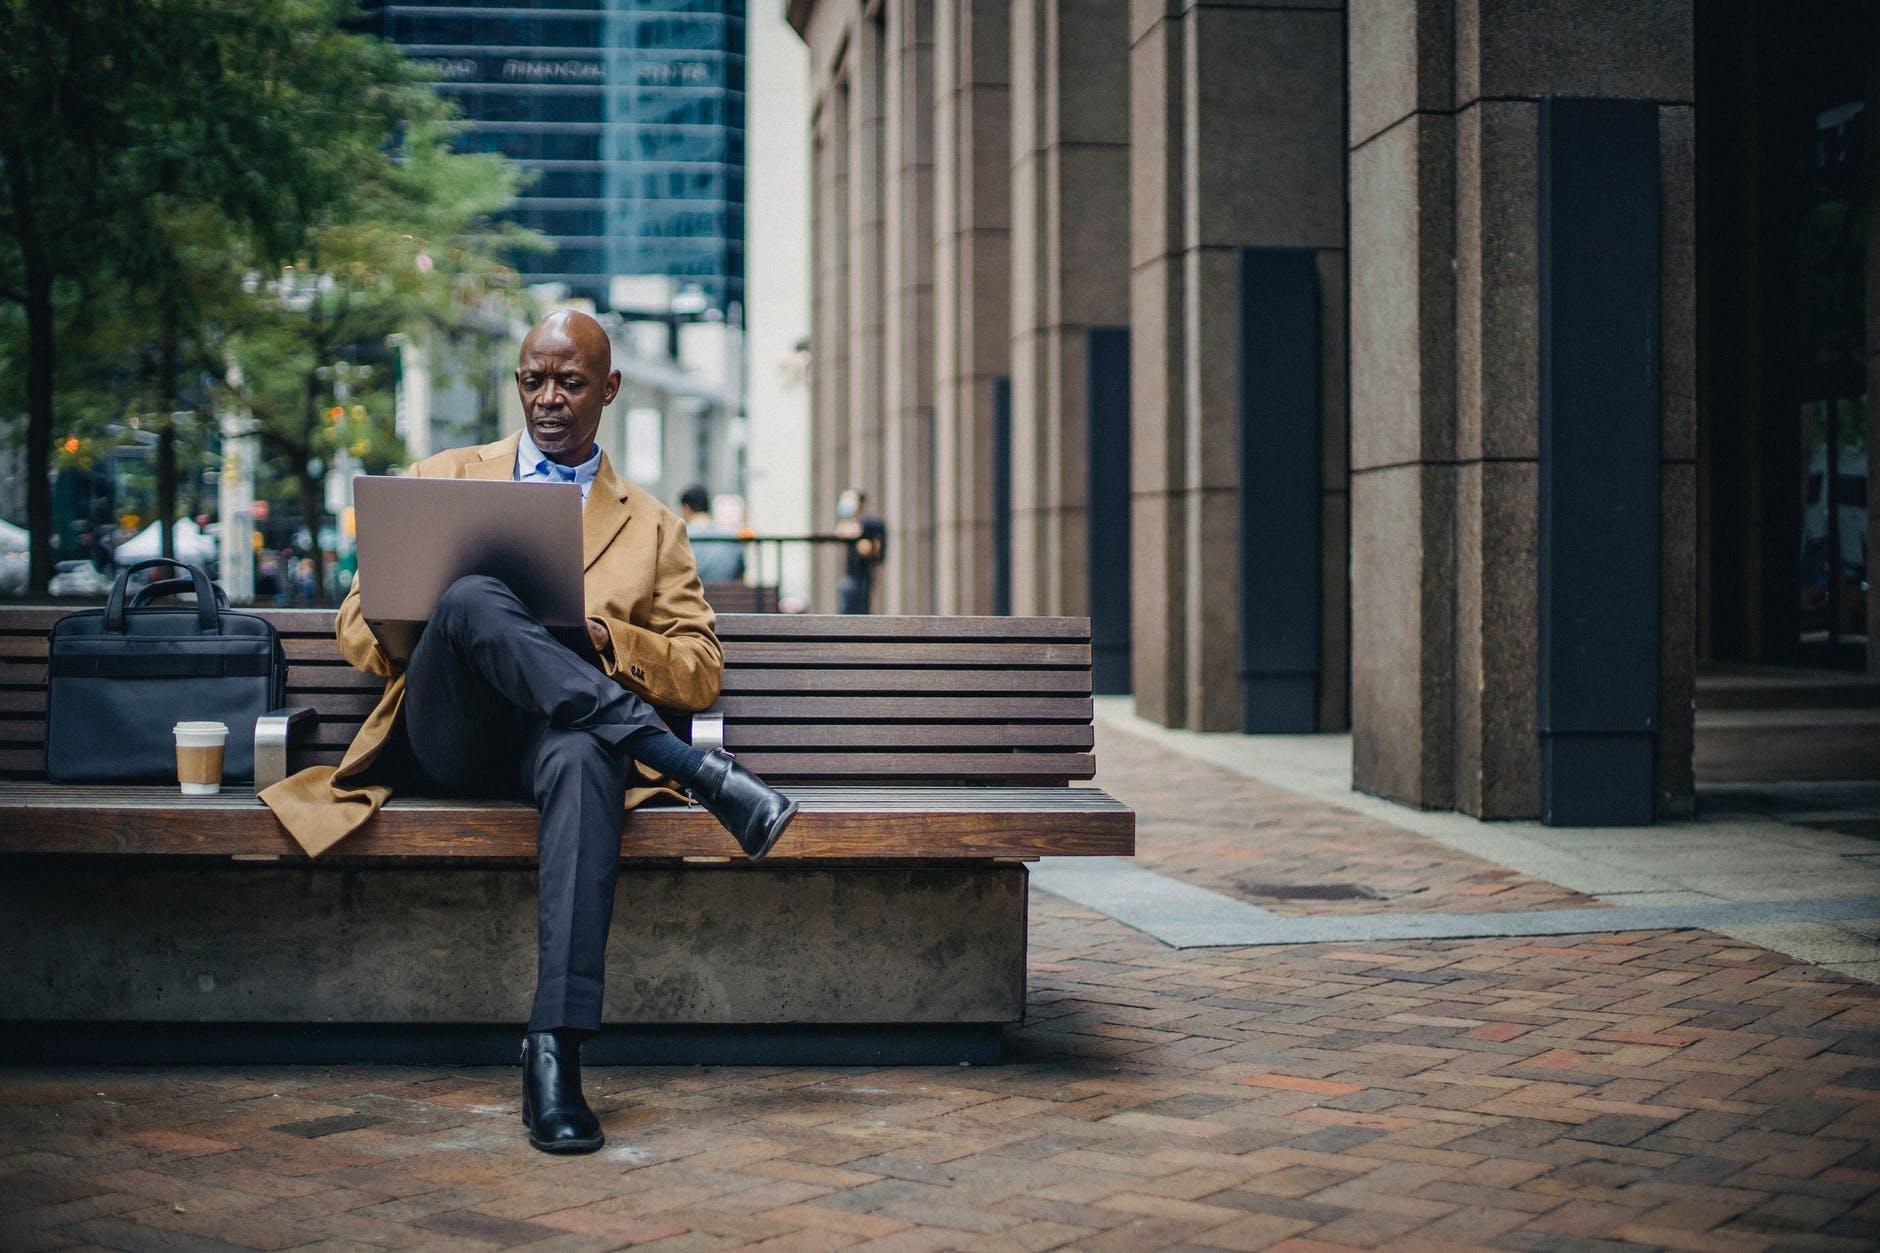 serious black businessman using laptop on city street on bench